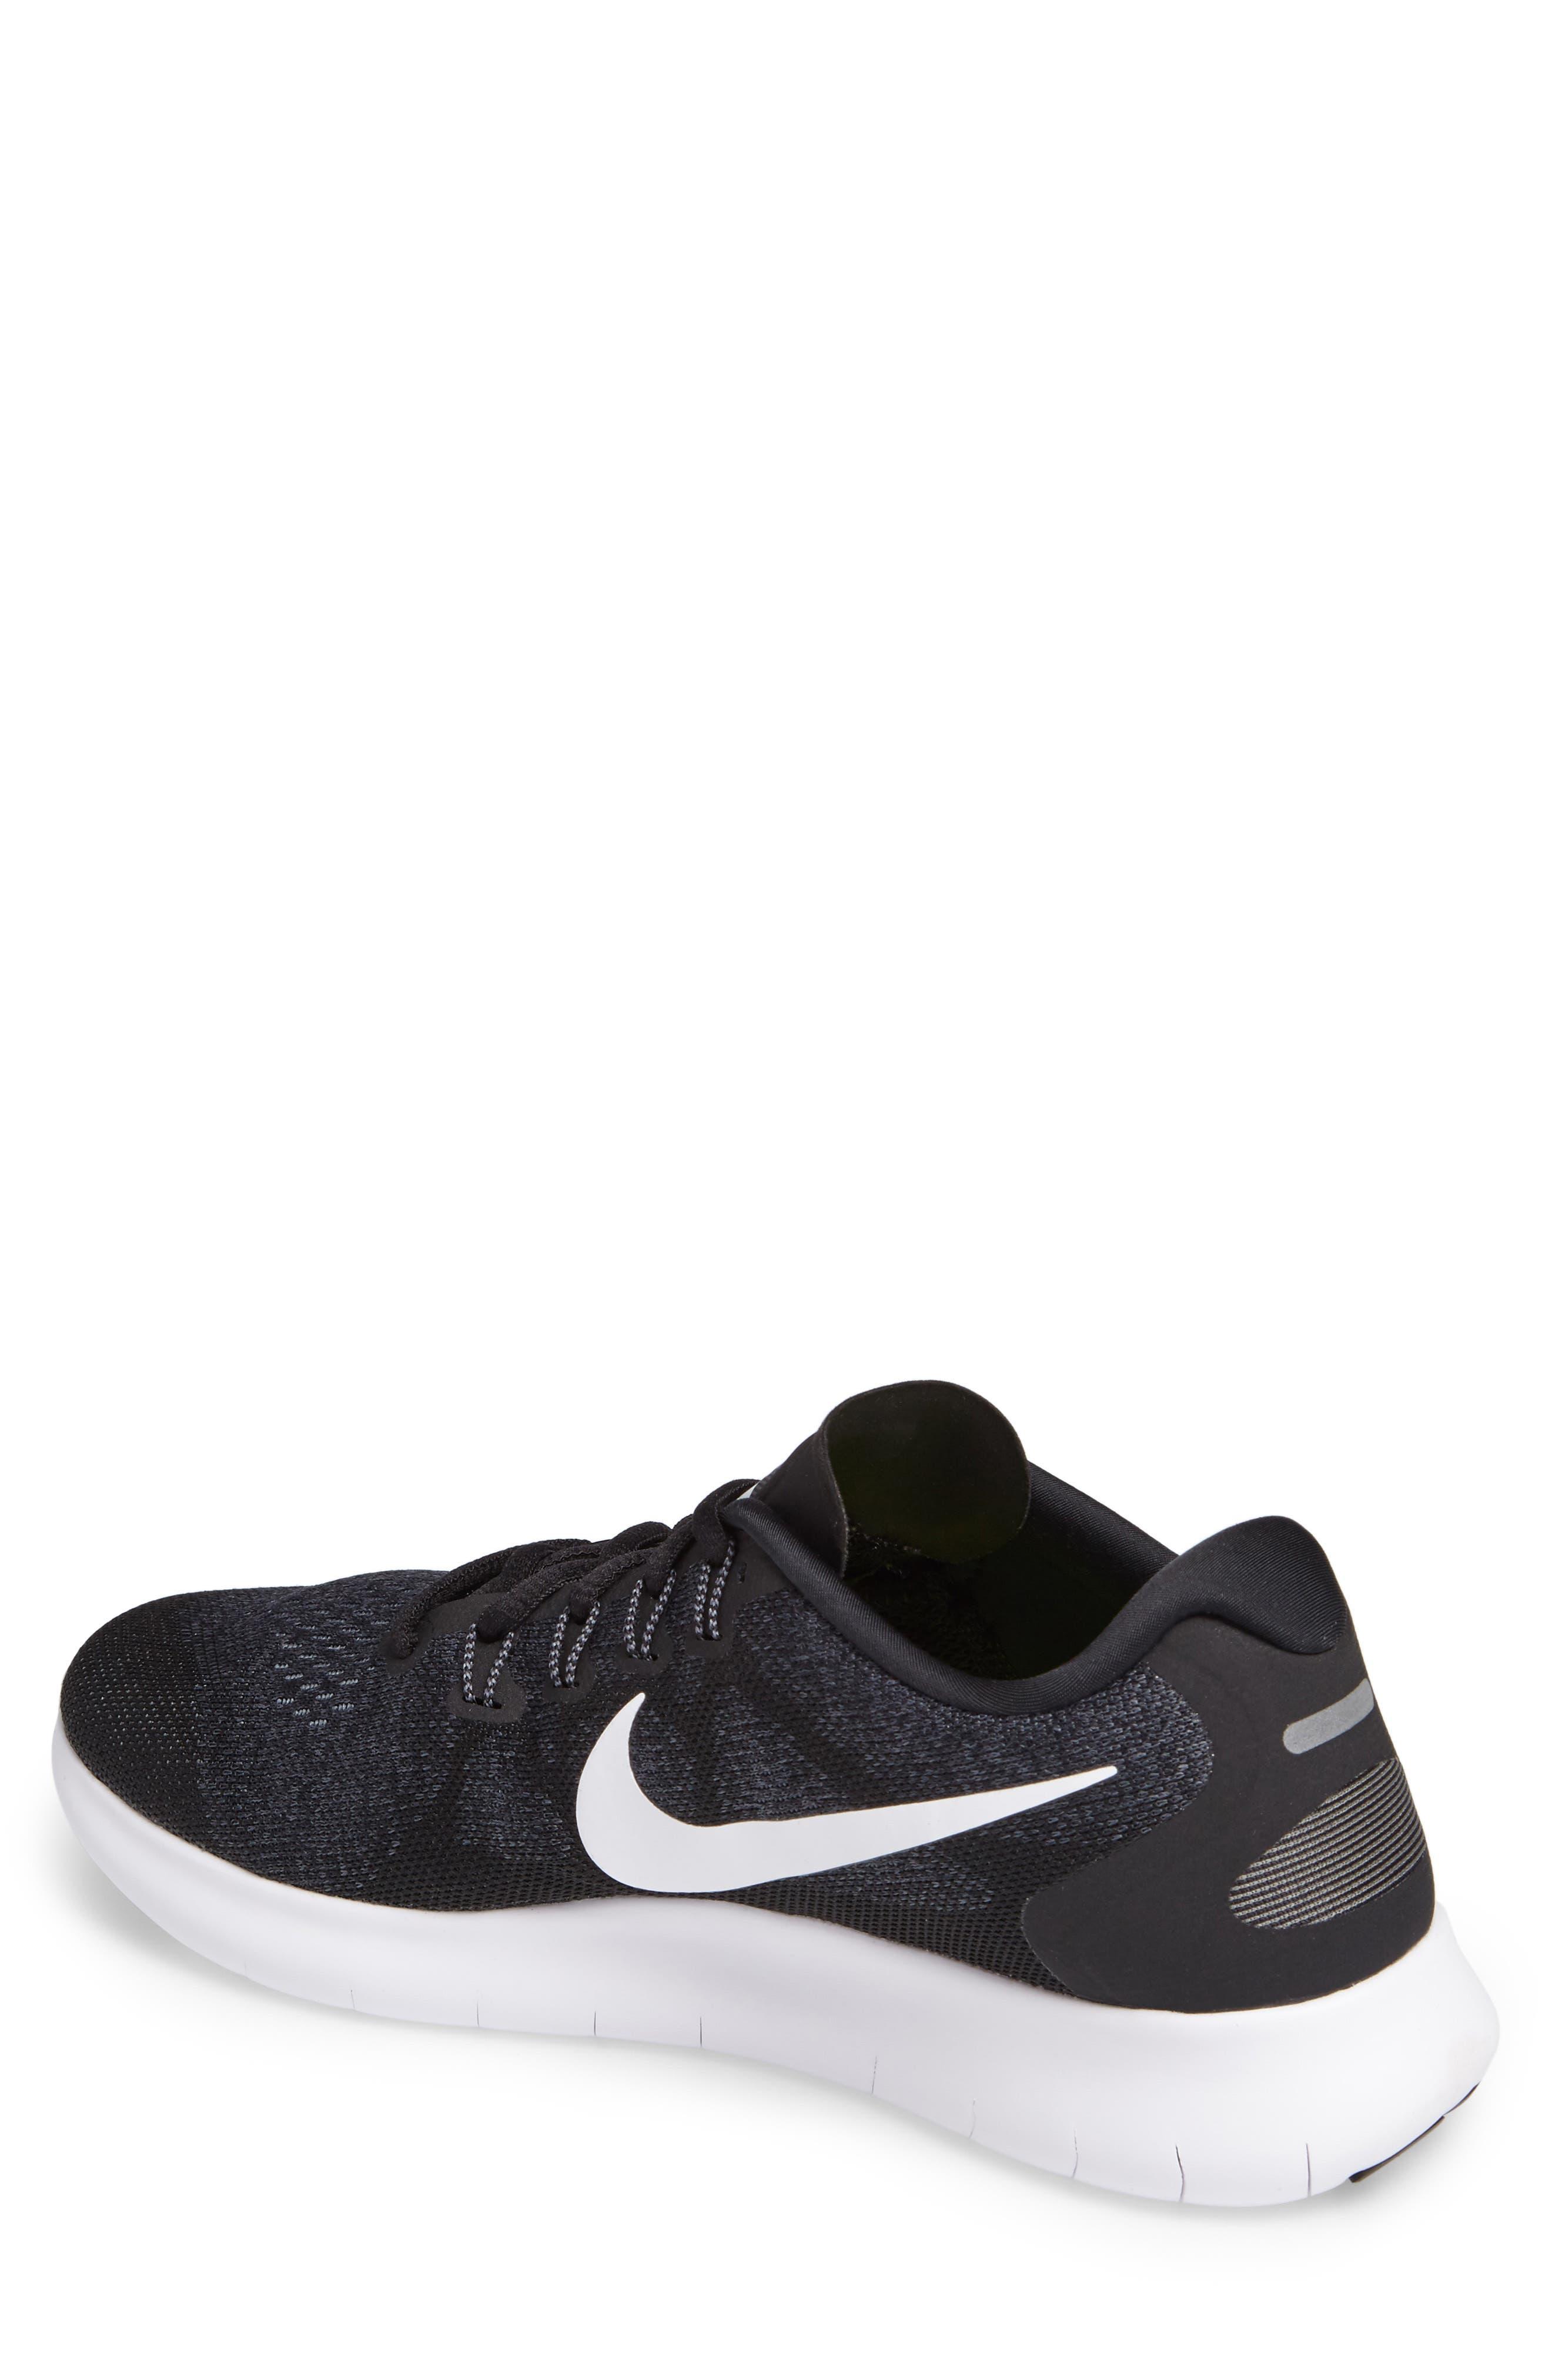 Free Run 2017 Running Shoe,                             Alternate thumbnail 2, color,                             Black/ White/ Grey/ Anthracite